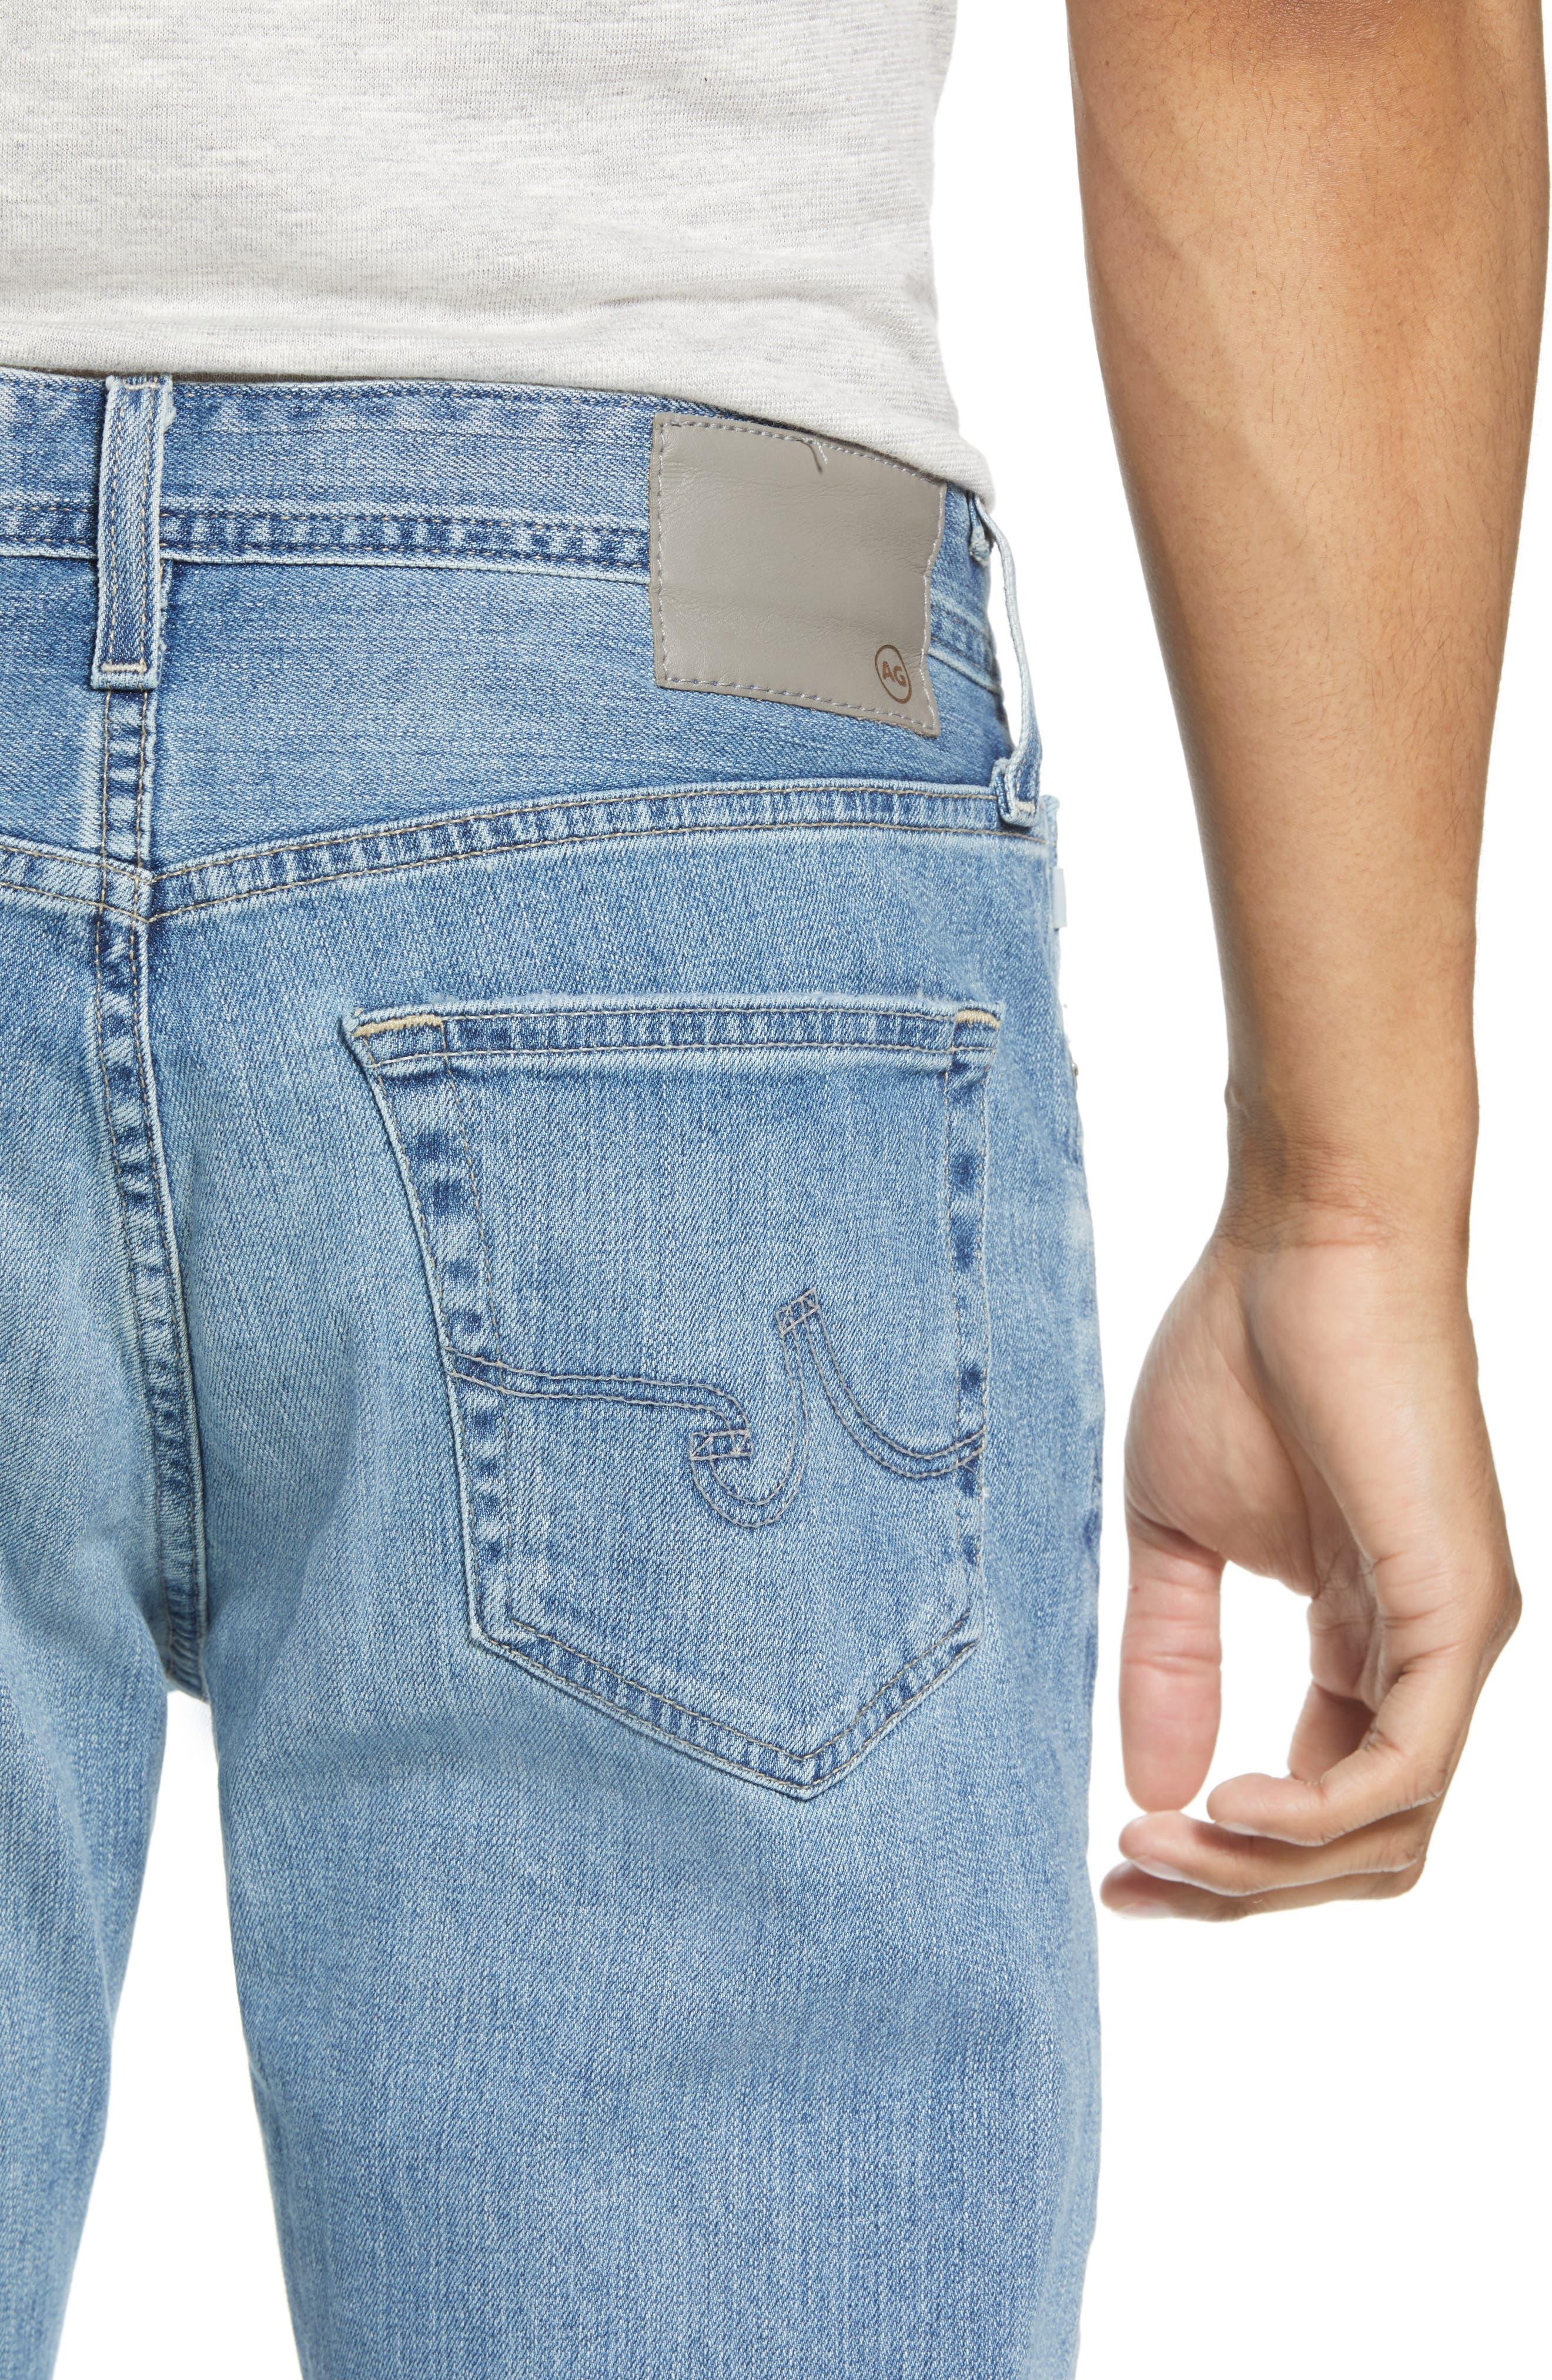 Everett Slim Straight Fit Jeans,                             Alternate thumbnail 4, color,                             18 Years Oceano